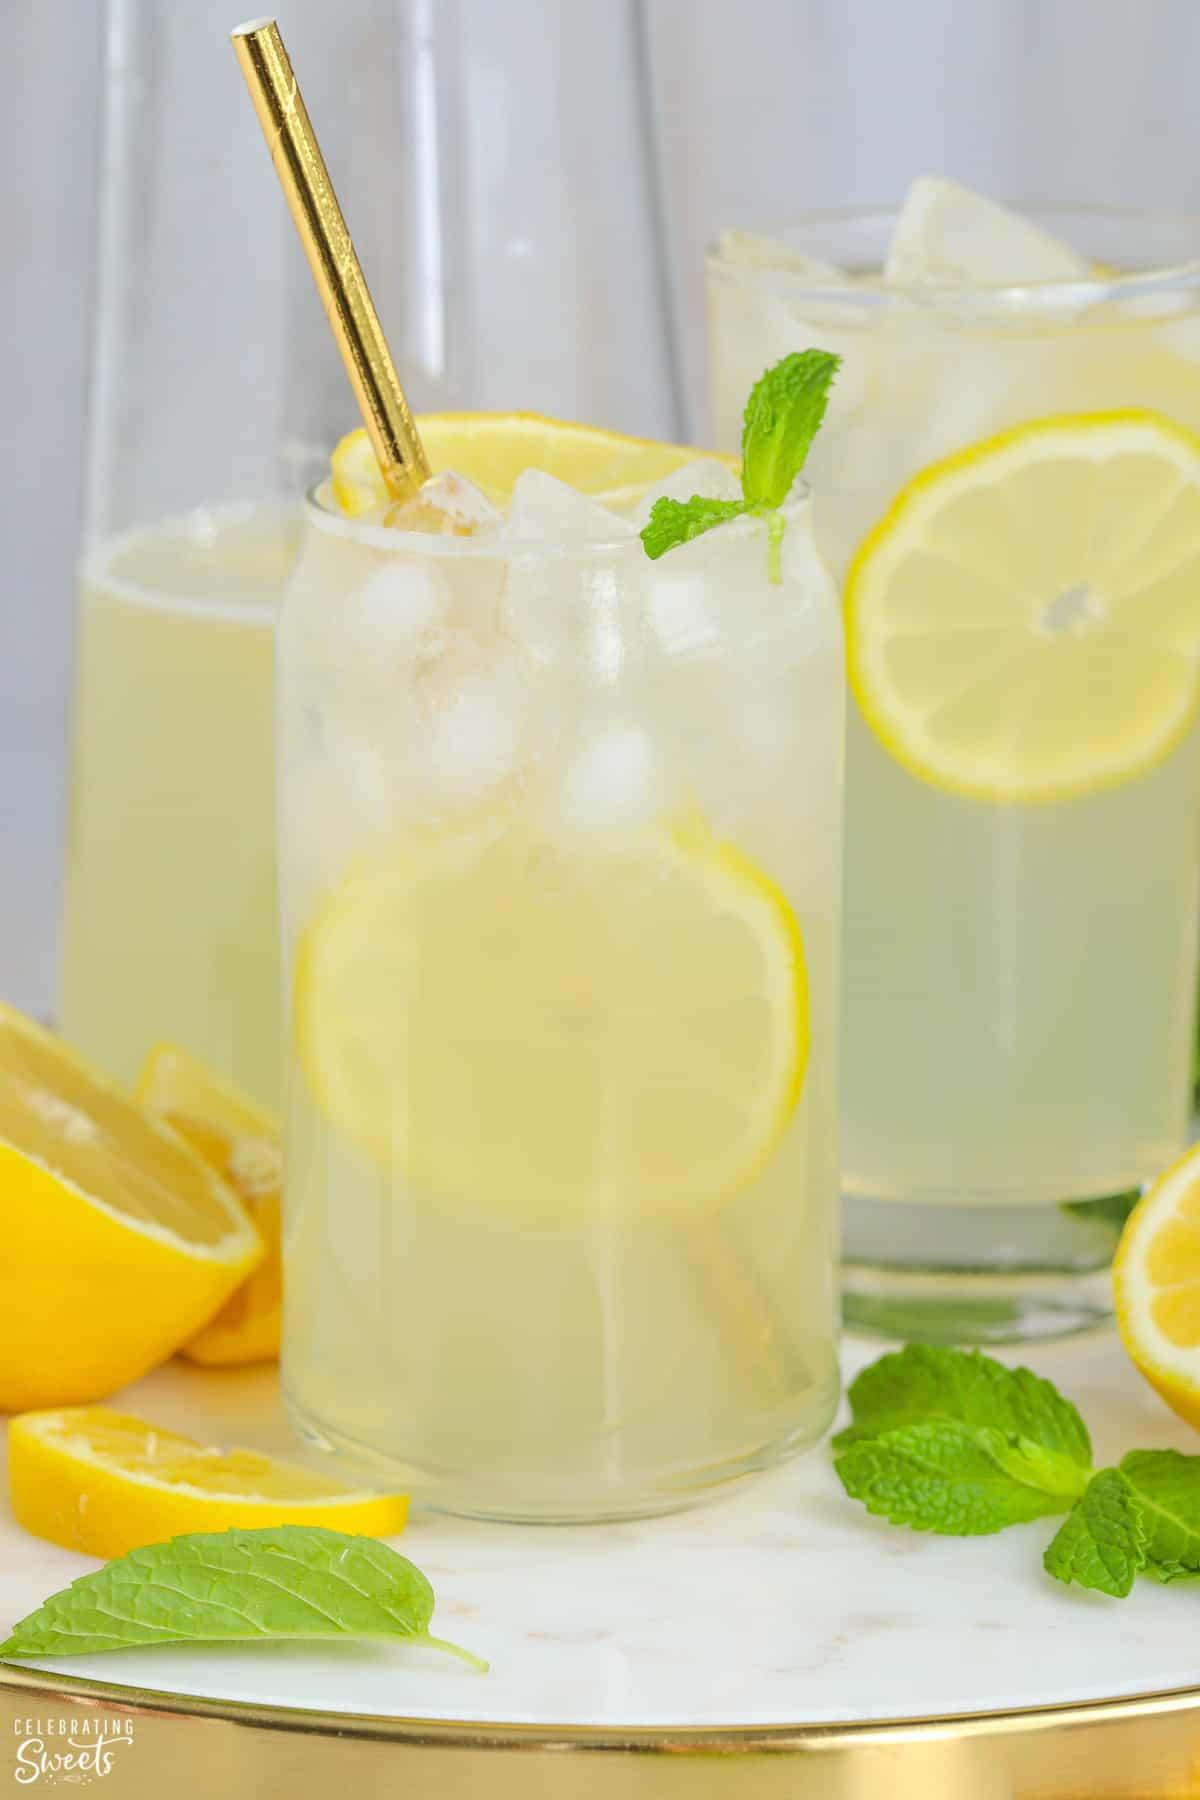 Glasses of lemonade garnished with lemon slices and mint.